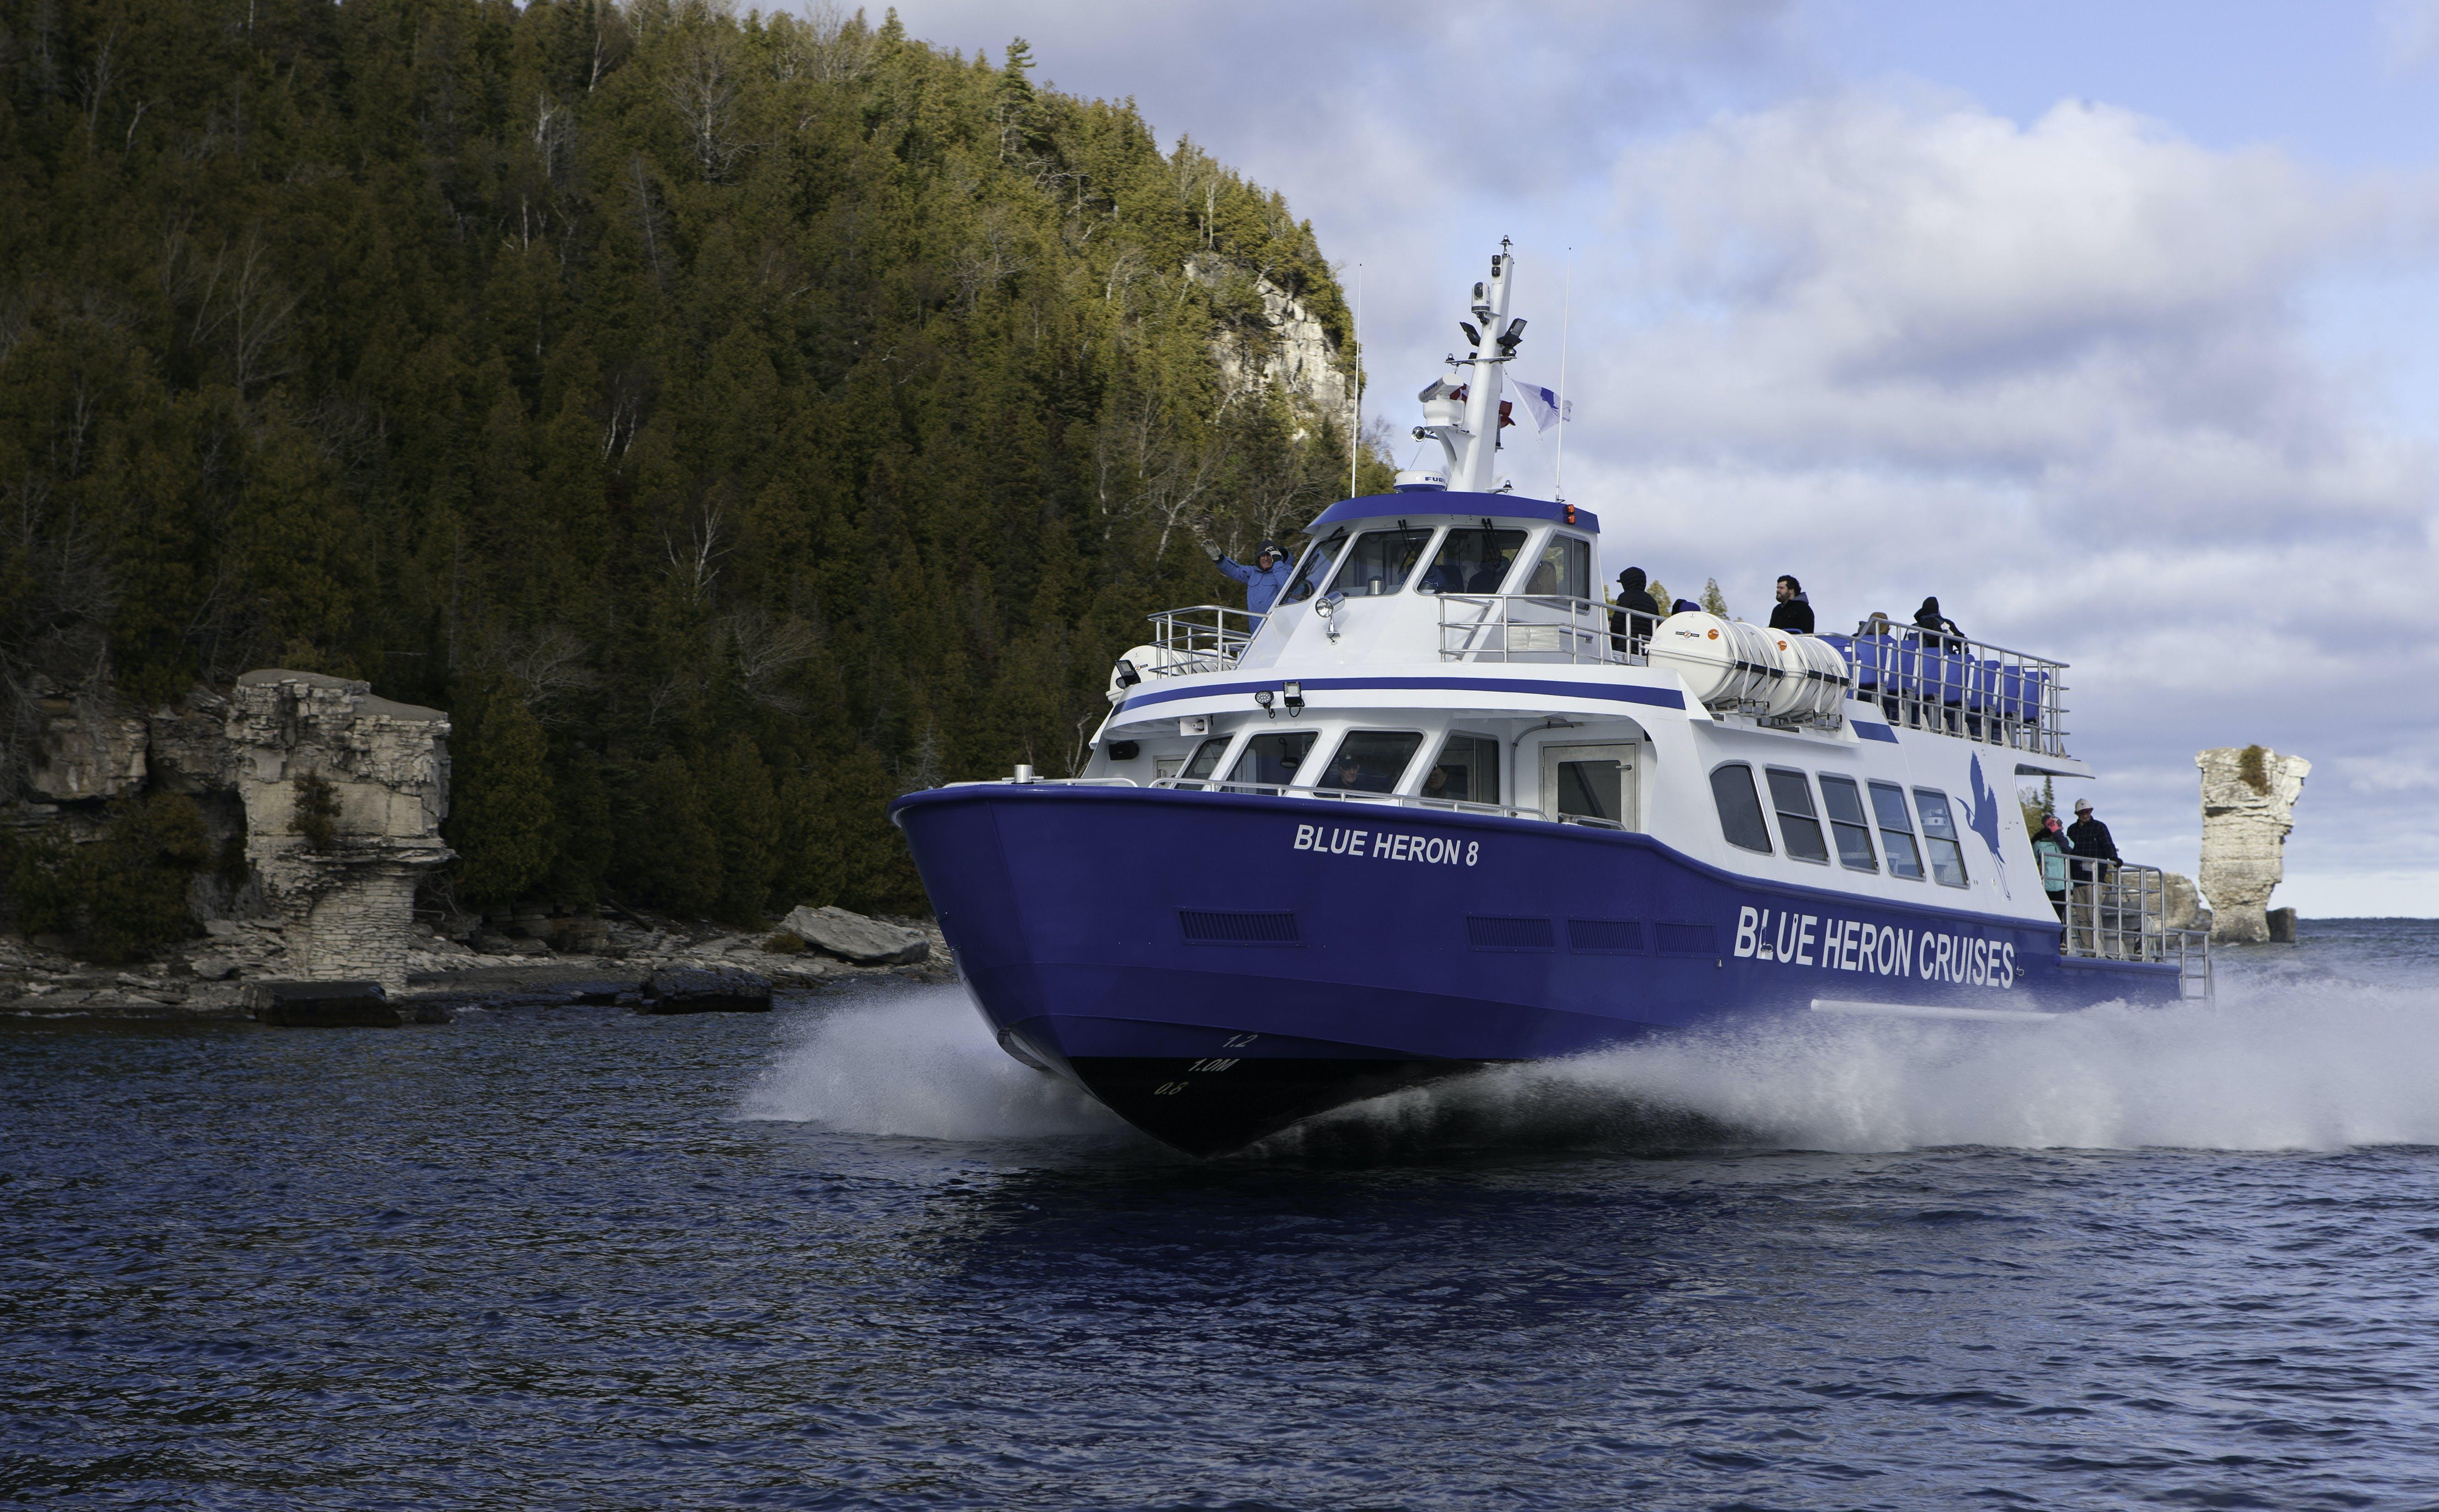 Free stock photo of Blue Heron 8, Blue Heron Cruises, boat, Fathom Five National Marine Park